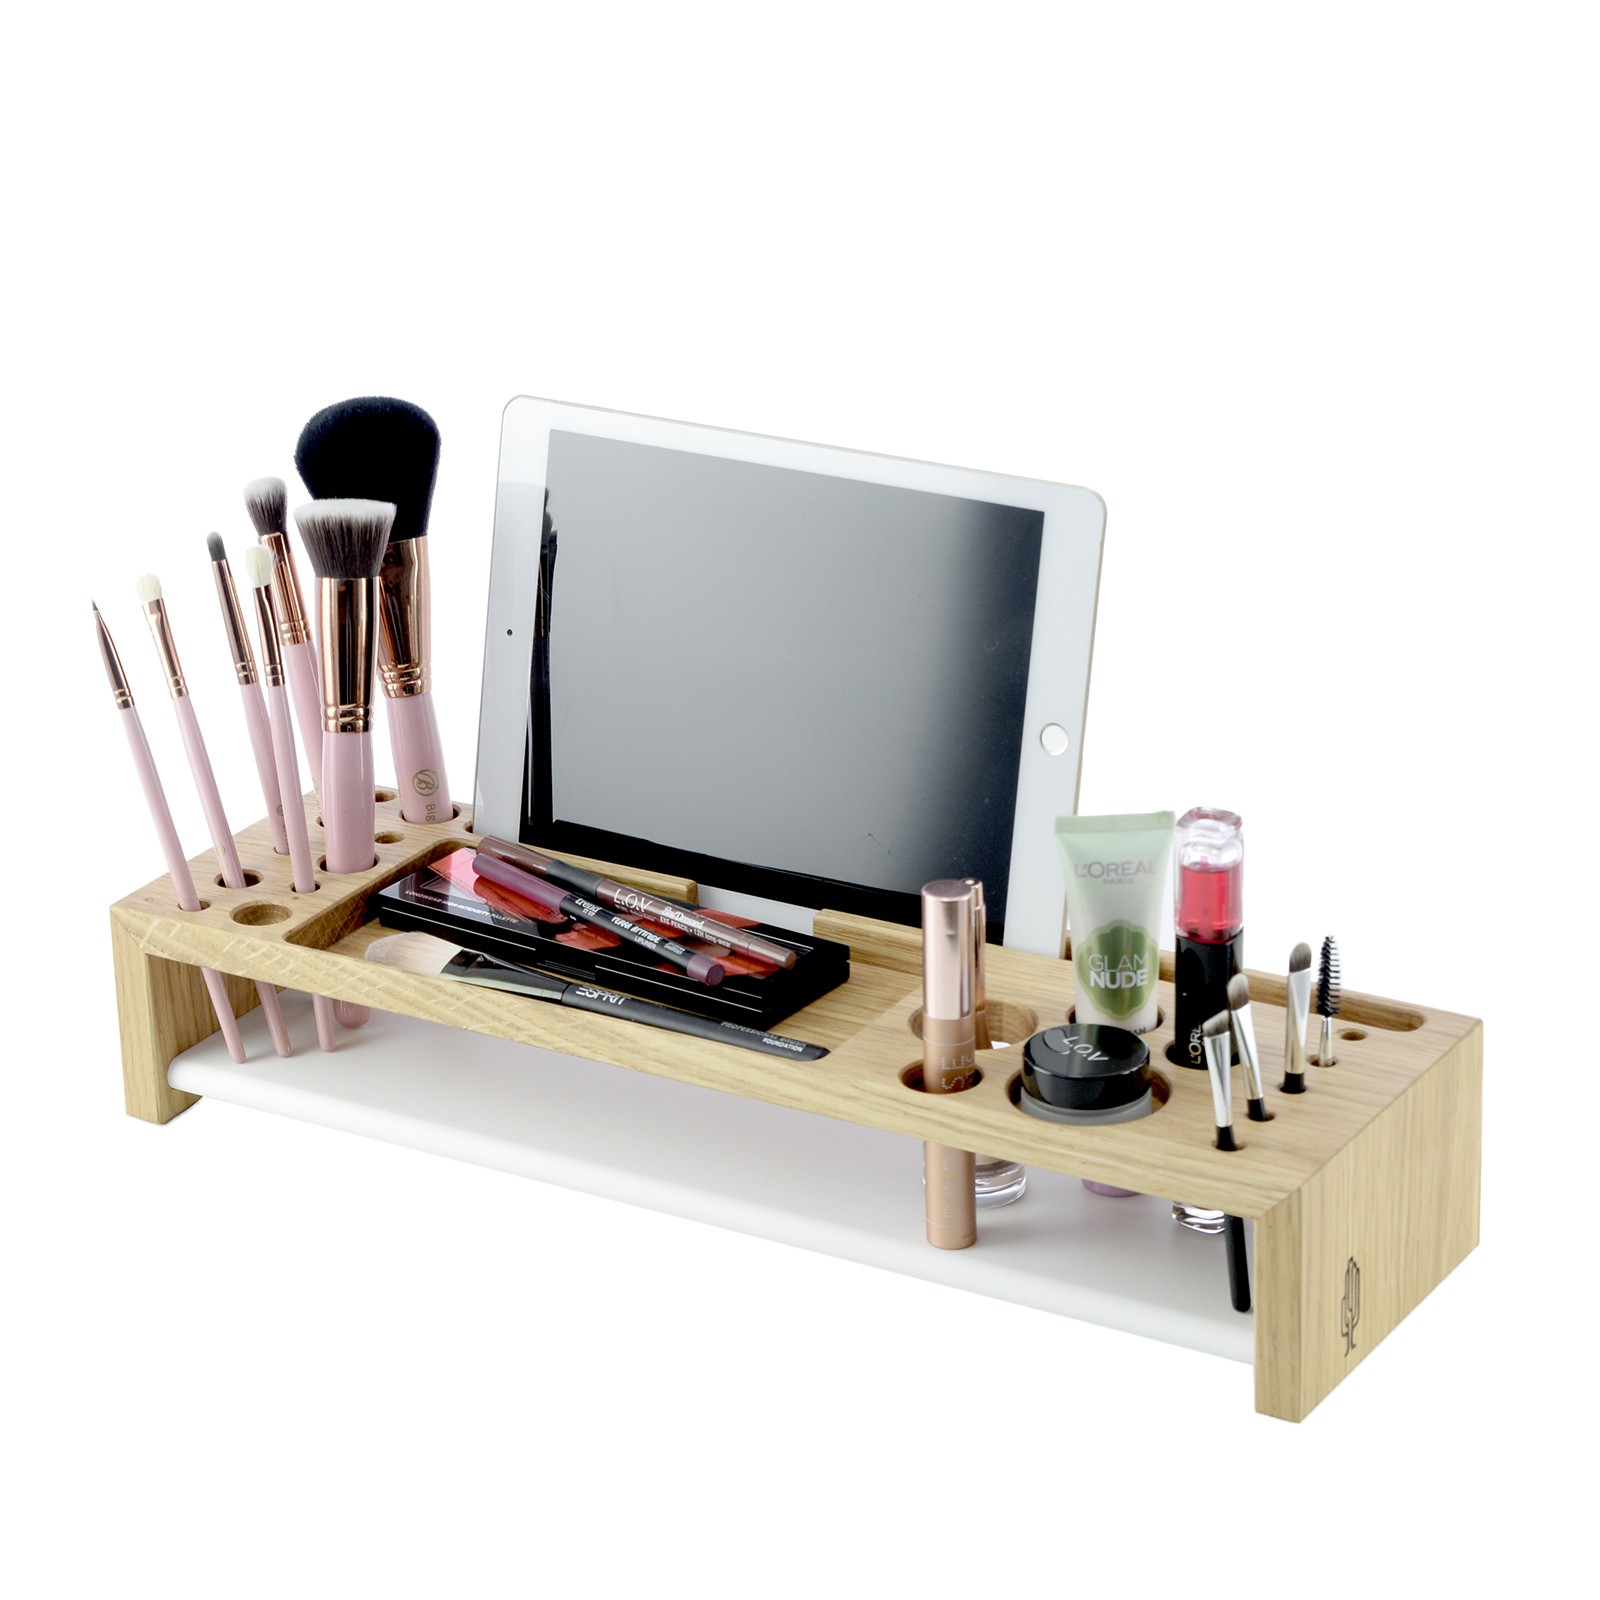 makeup organizer koloro kosmetik organizer aus holz aufbewahrung f r schminke holzbutiq. Black Bedroom Furniture Sets. Home Design Ideas